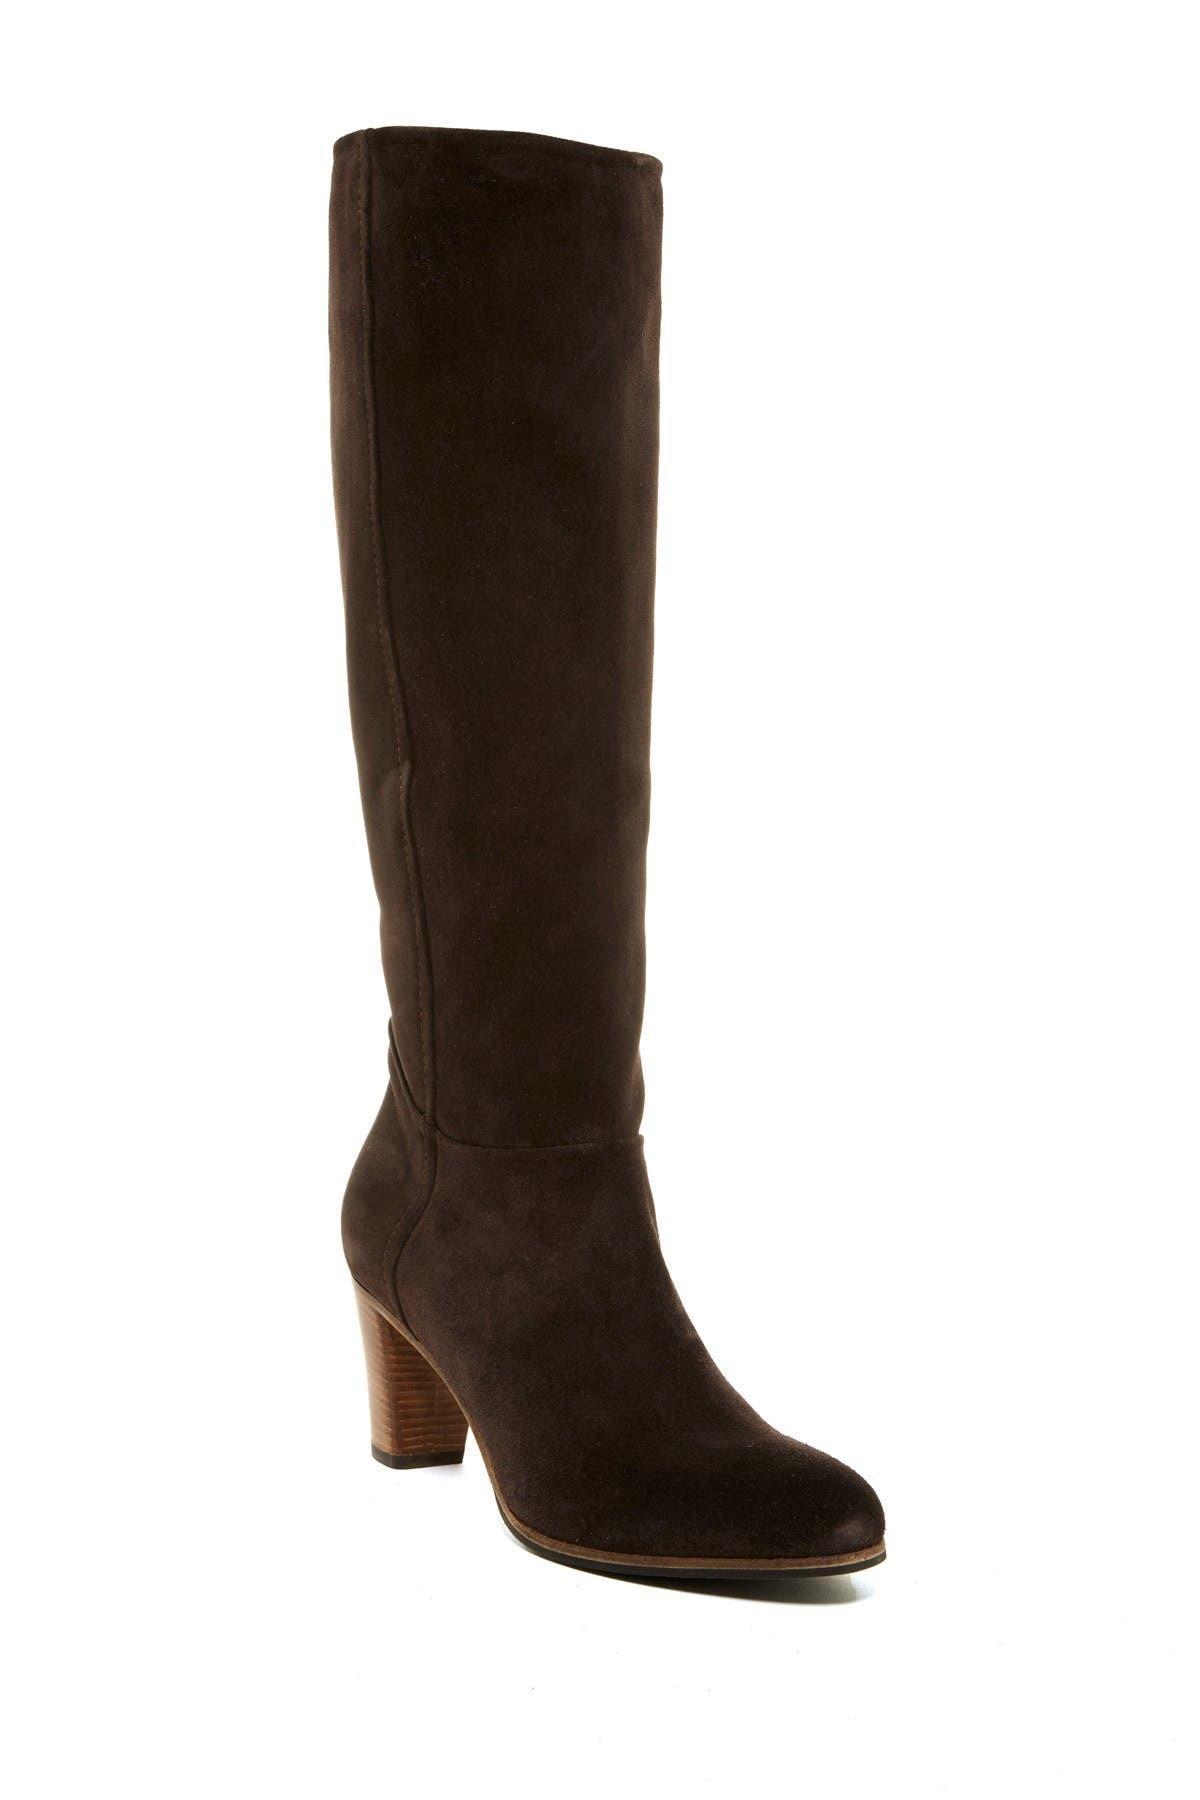 Image of Alberto Fermani Loreo Tall Boot